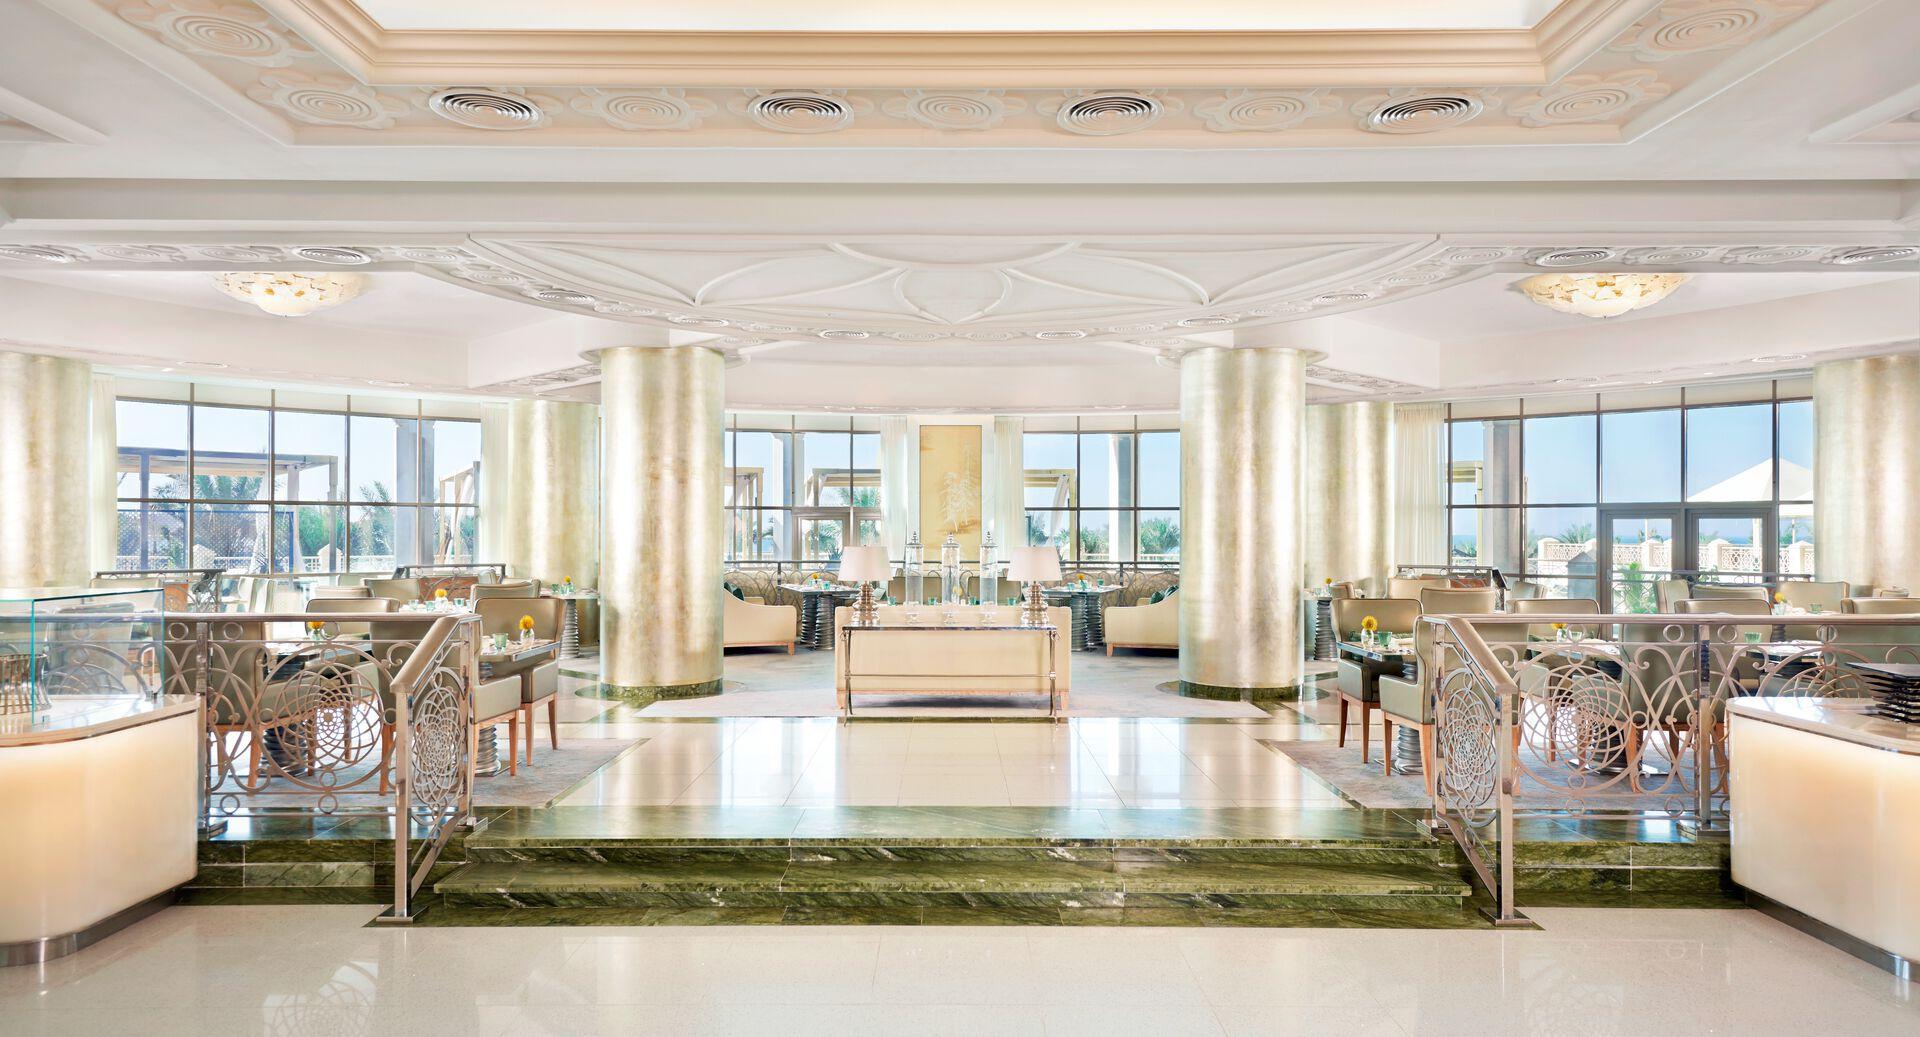 Emirats Arabes Unis - Ras Al Khaimah - Hôtel Waldorf Astoria Ras Al Khaimah 5*